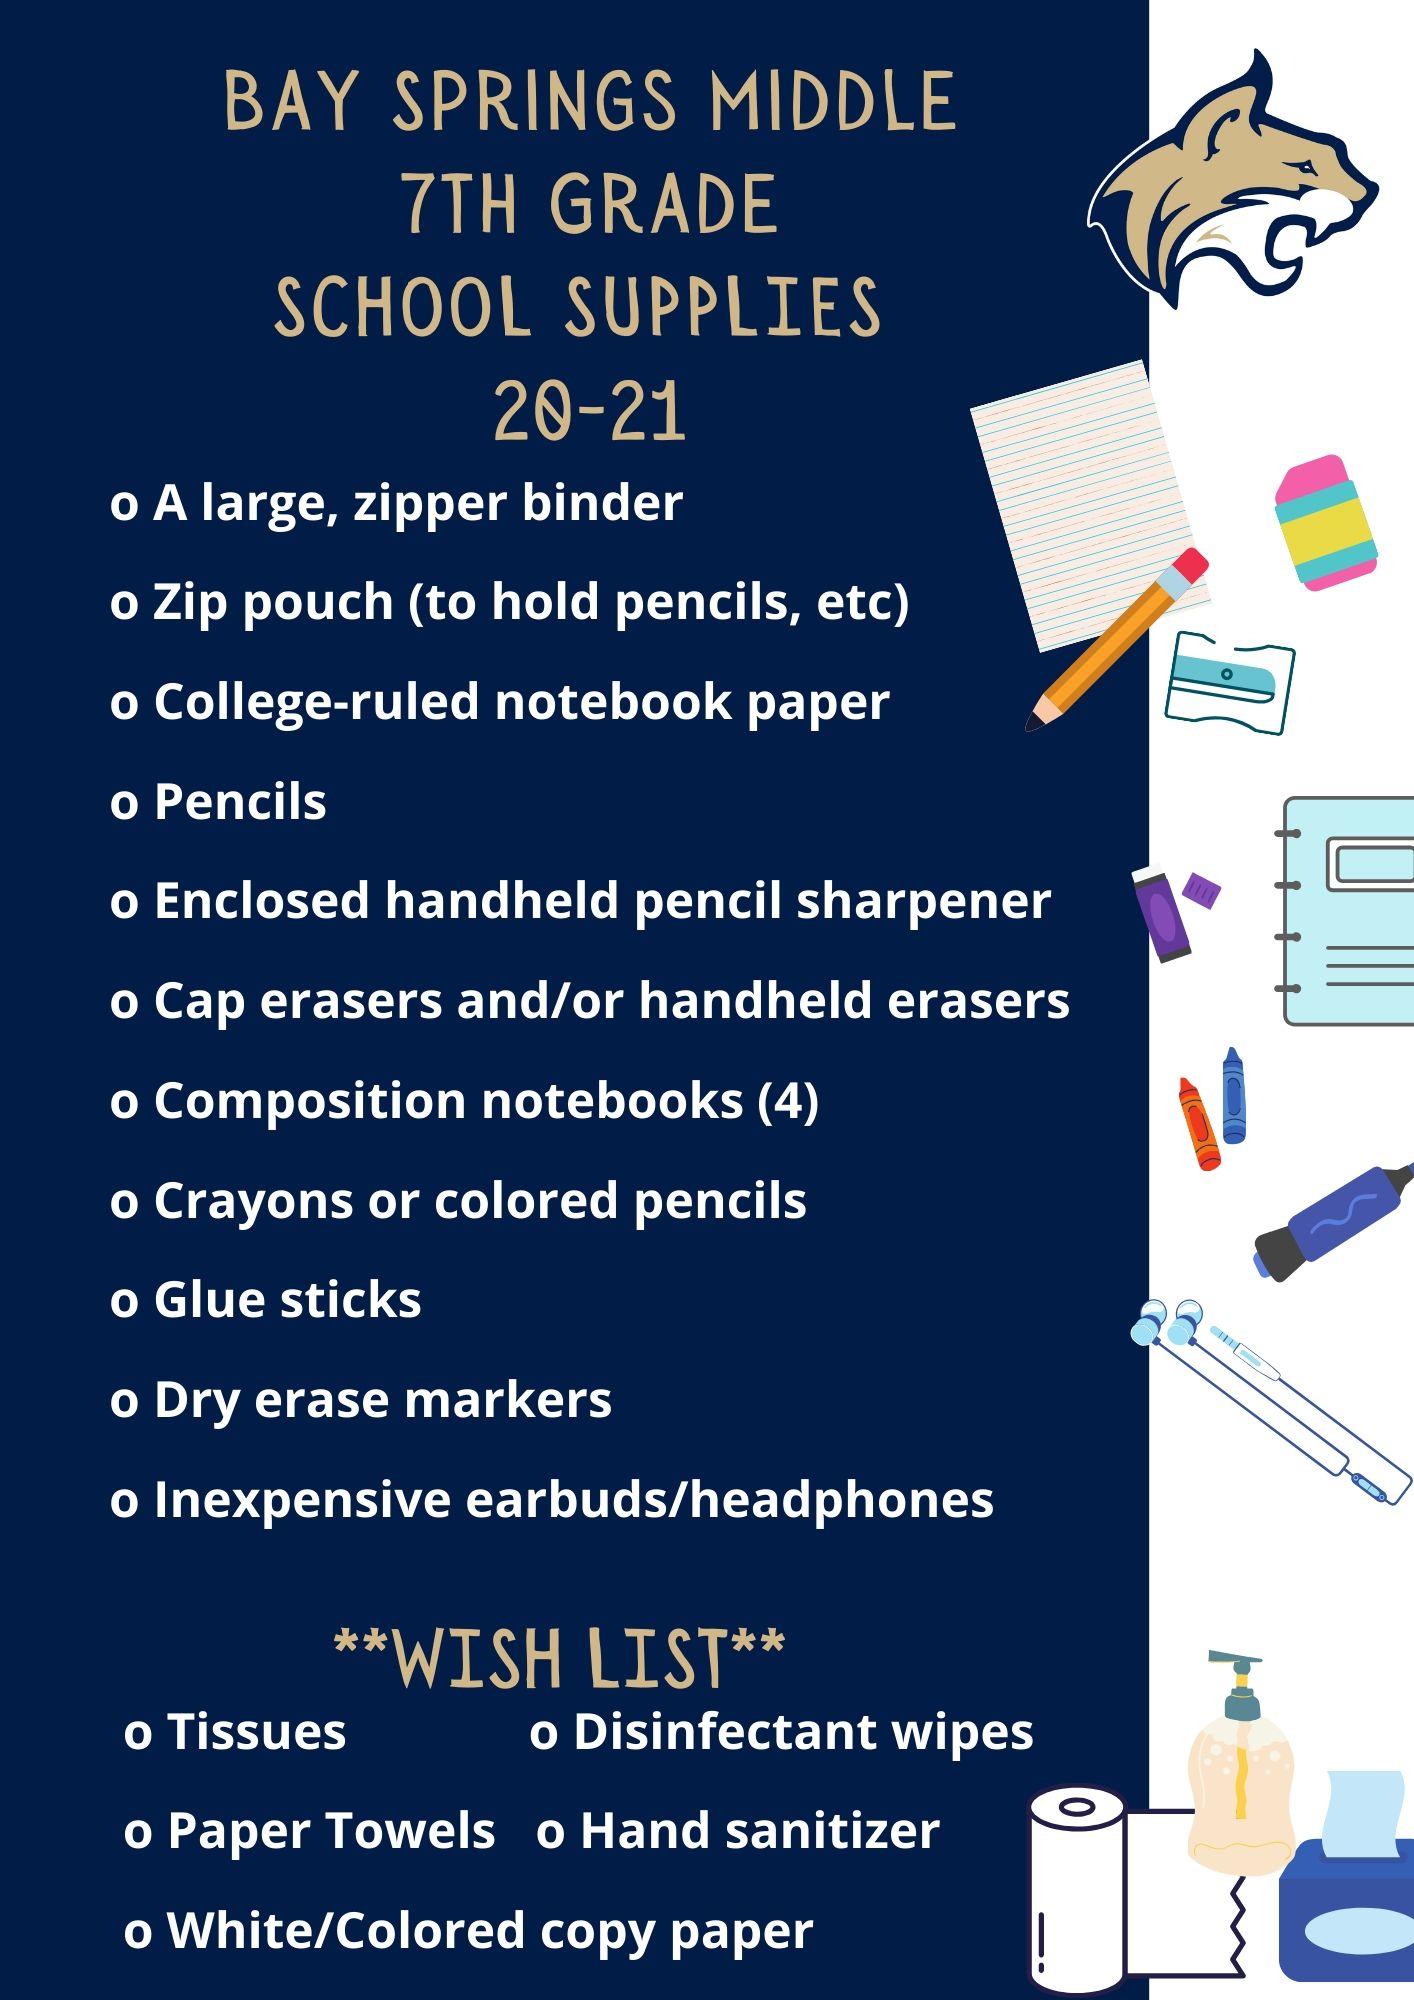 School Supply List ~ 7th Grade